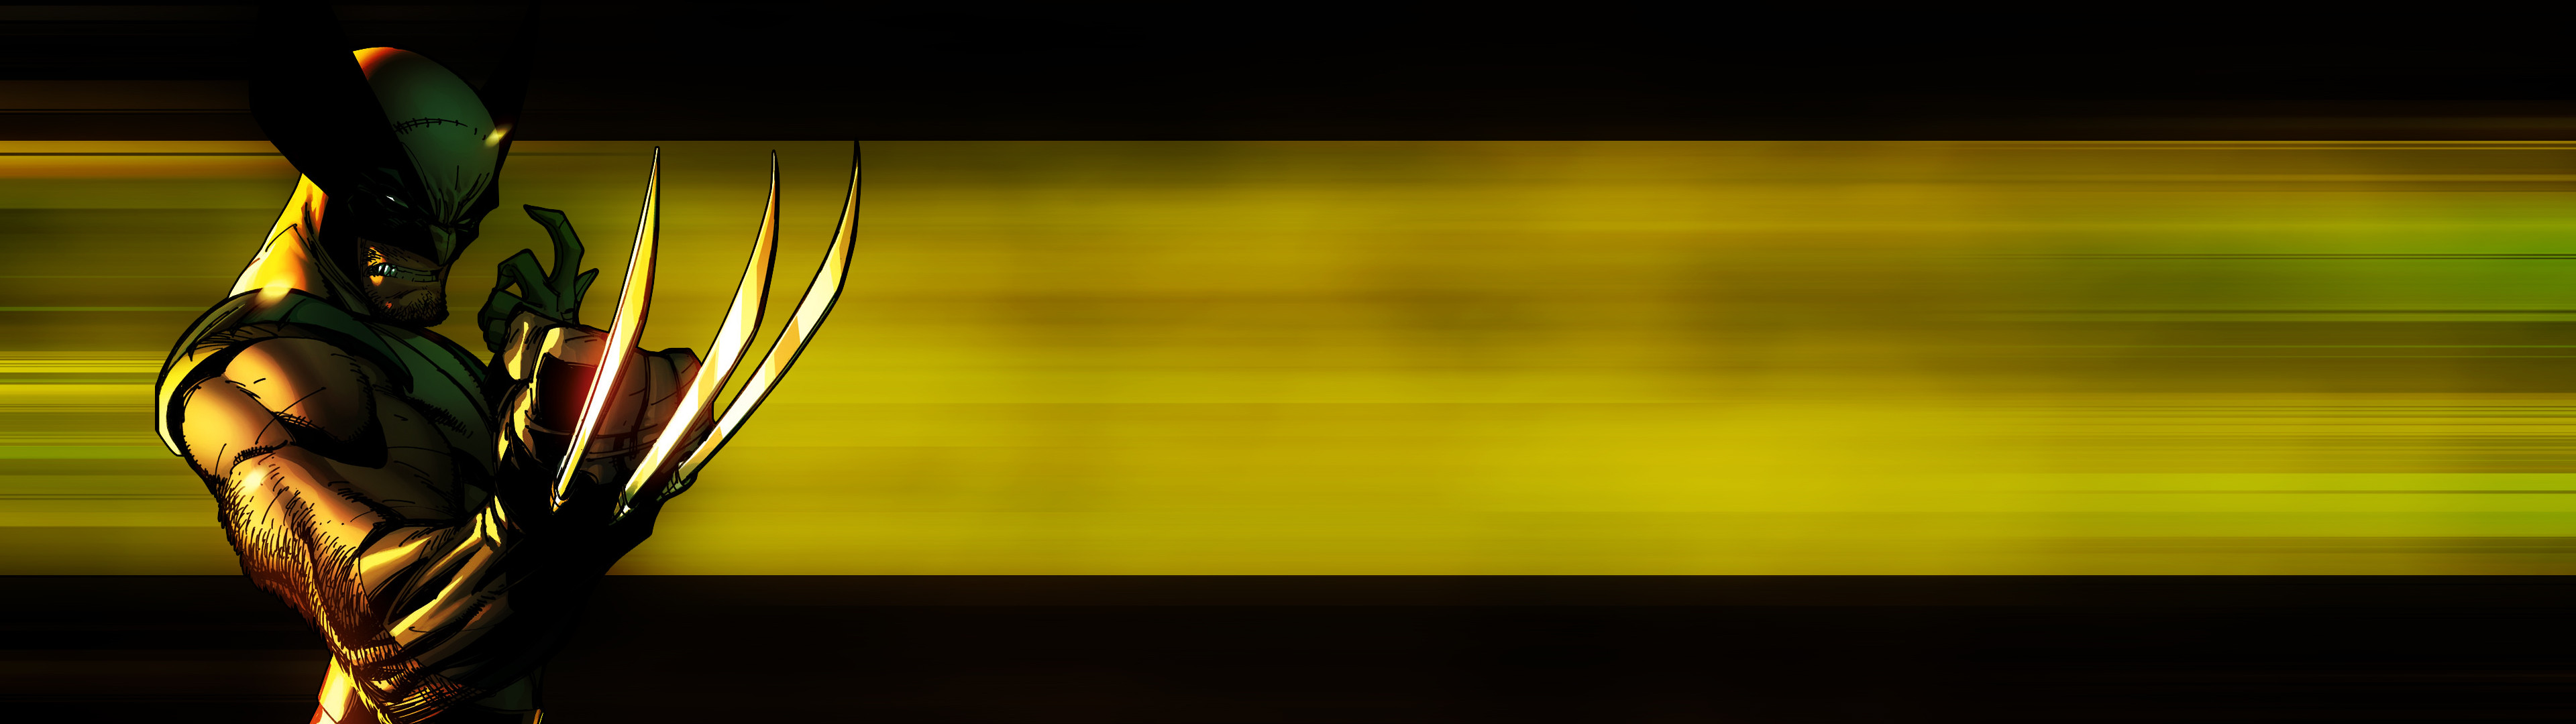 Wolverine Dual Monitor 1920x1080 iimgurcom 3840x1080